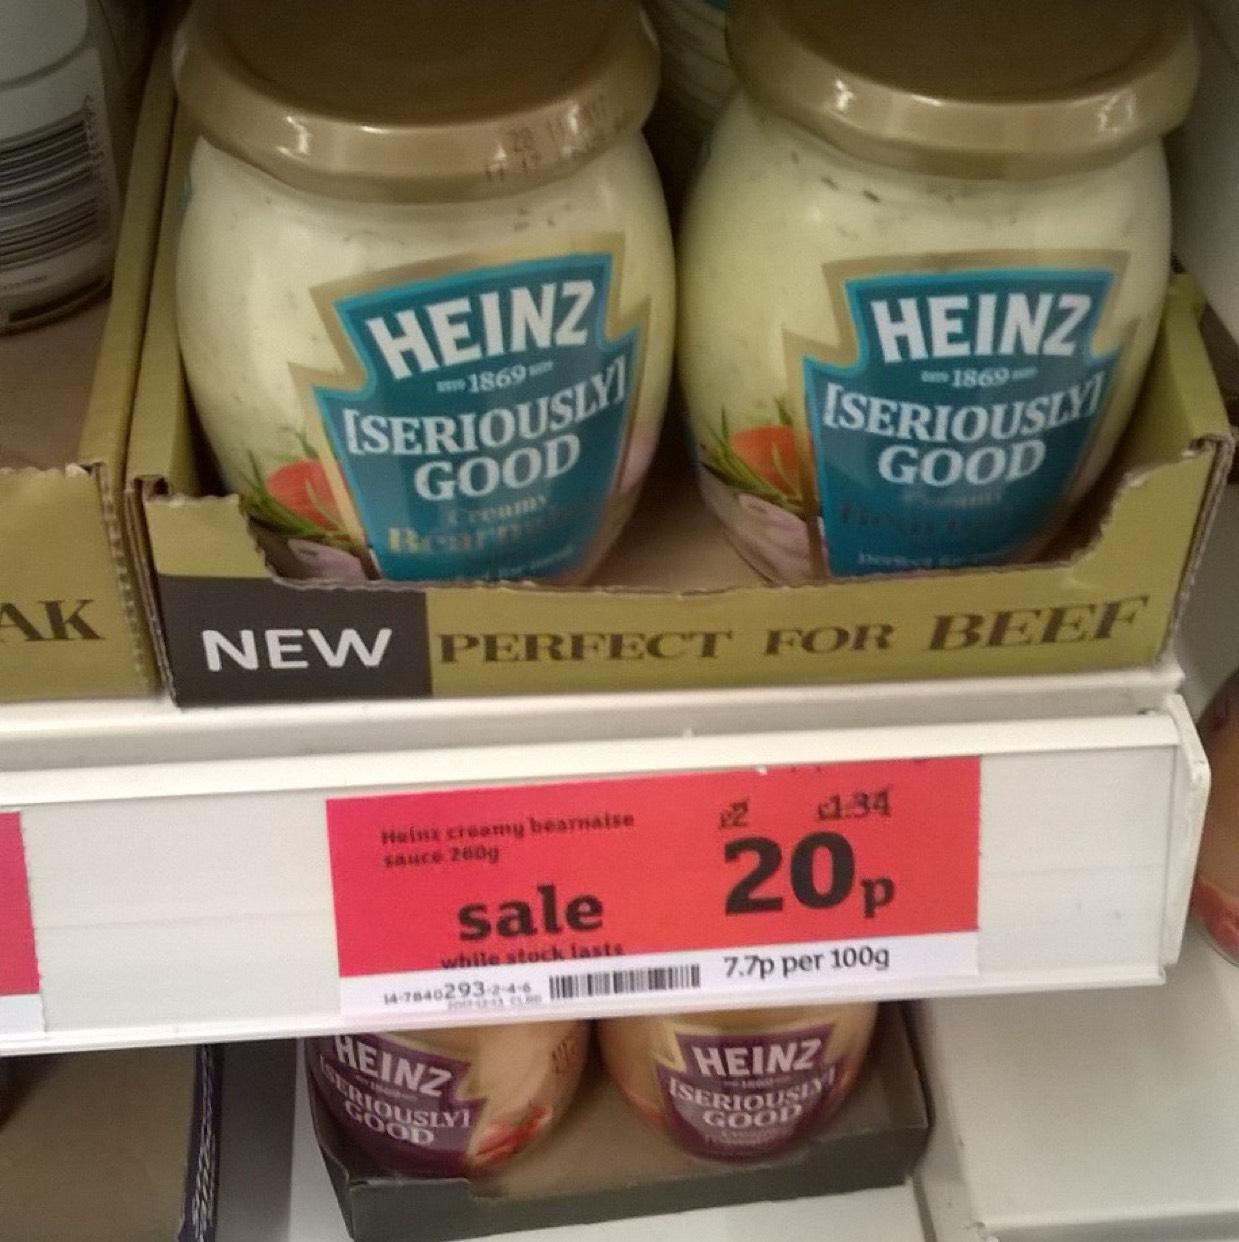 Heinz Creamy Béarnaise Sauce 20p in Sainsbury's Calcot